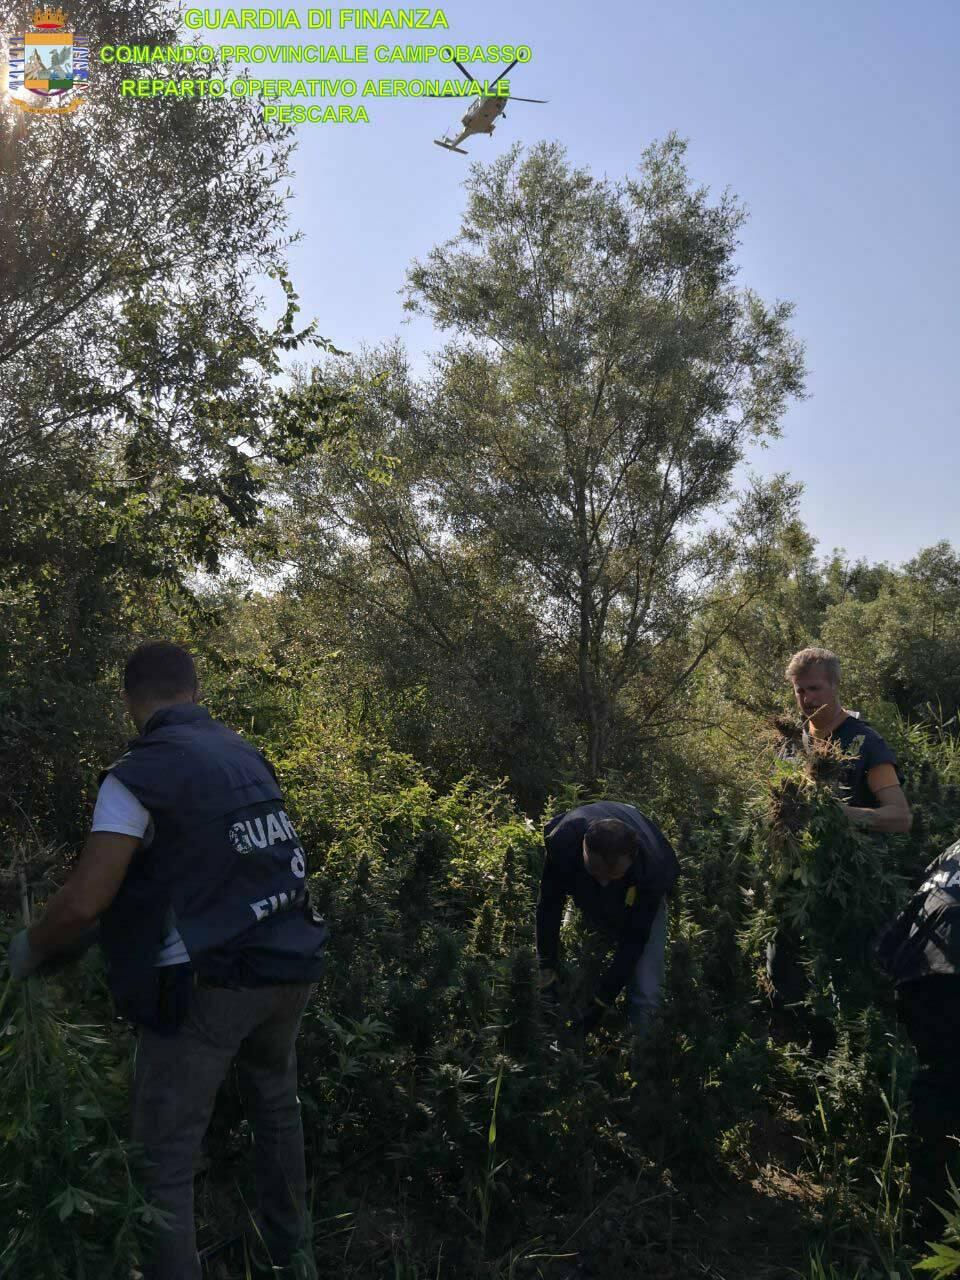 Piantagione marijuana finanza Campomarino roan